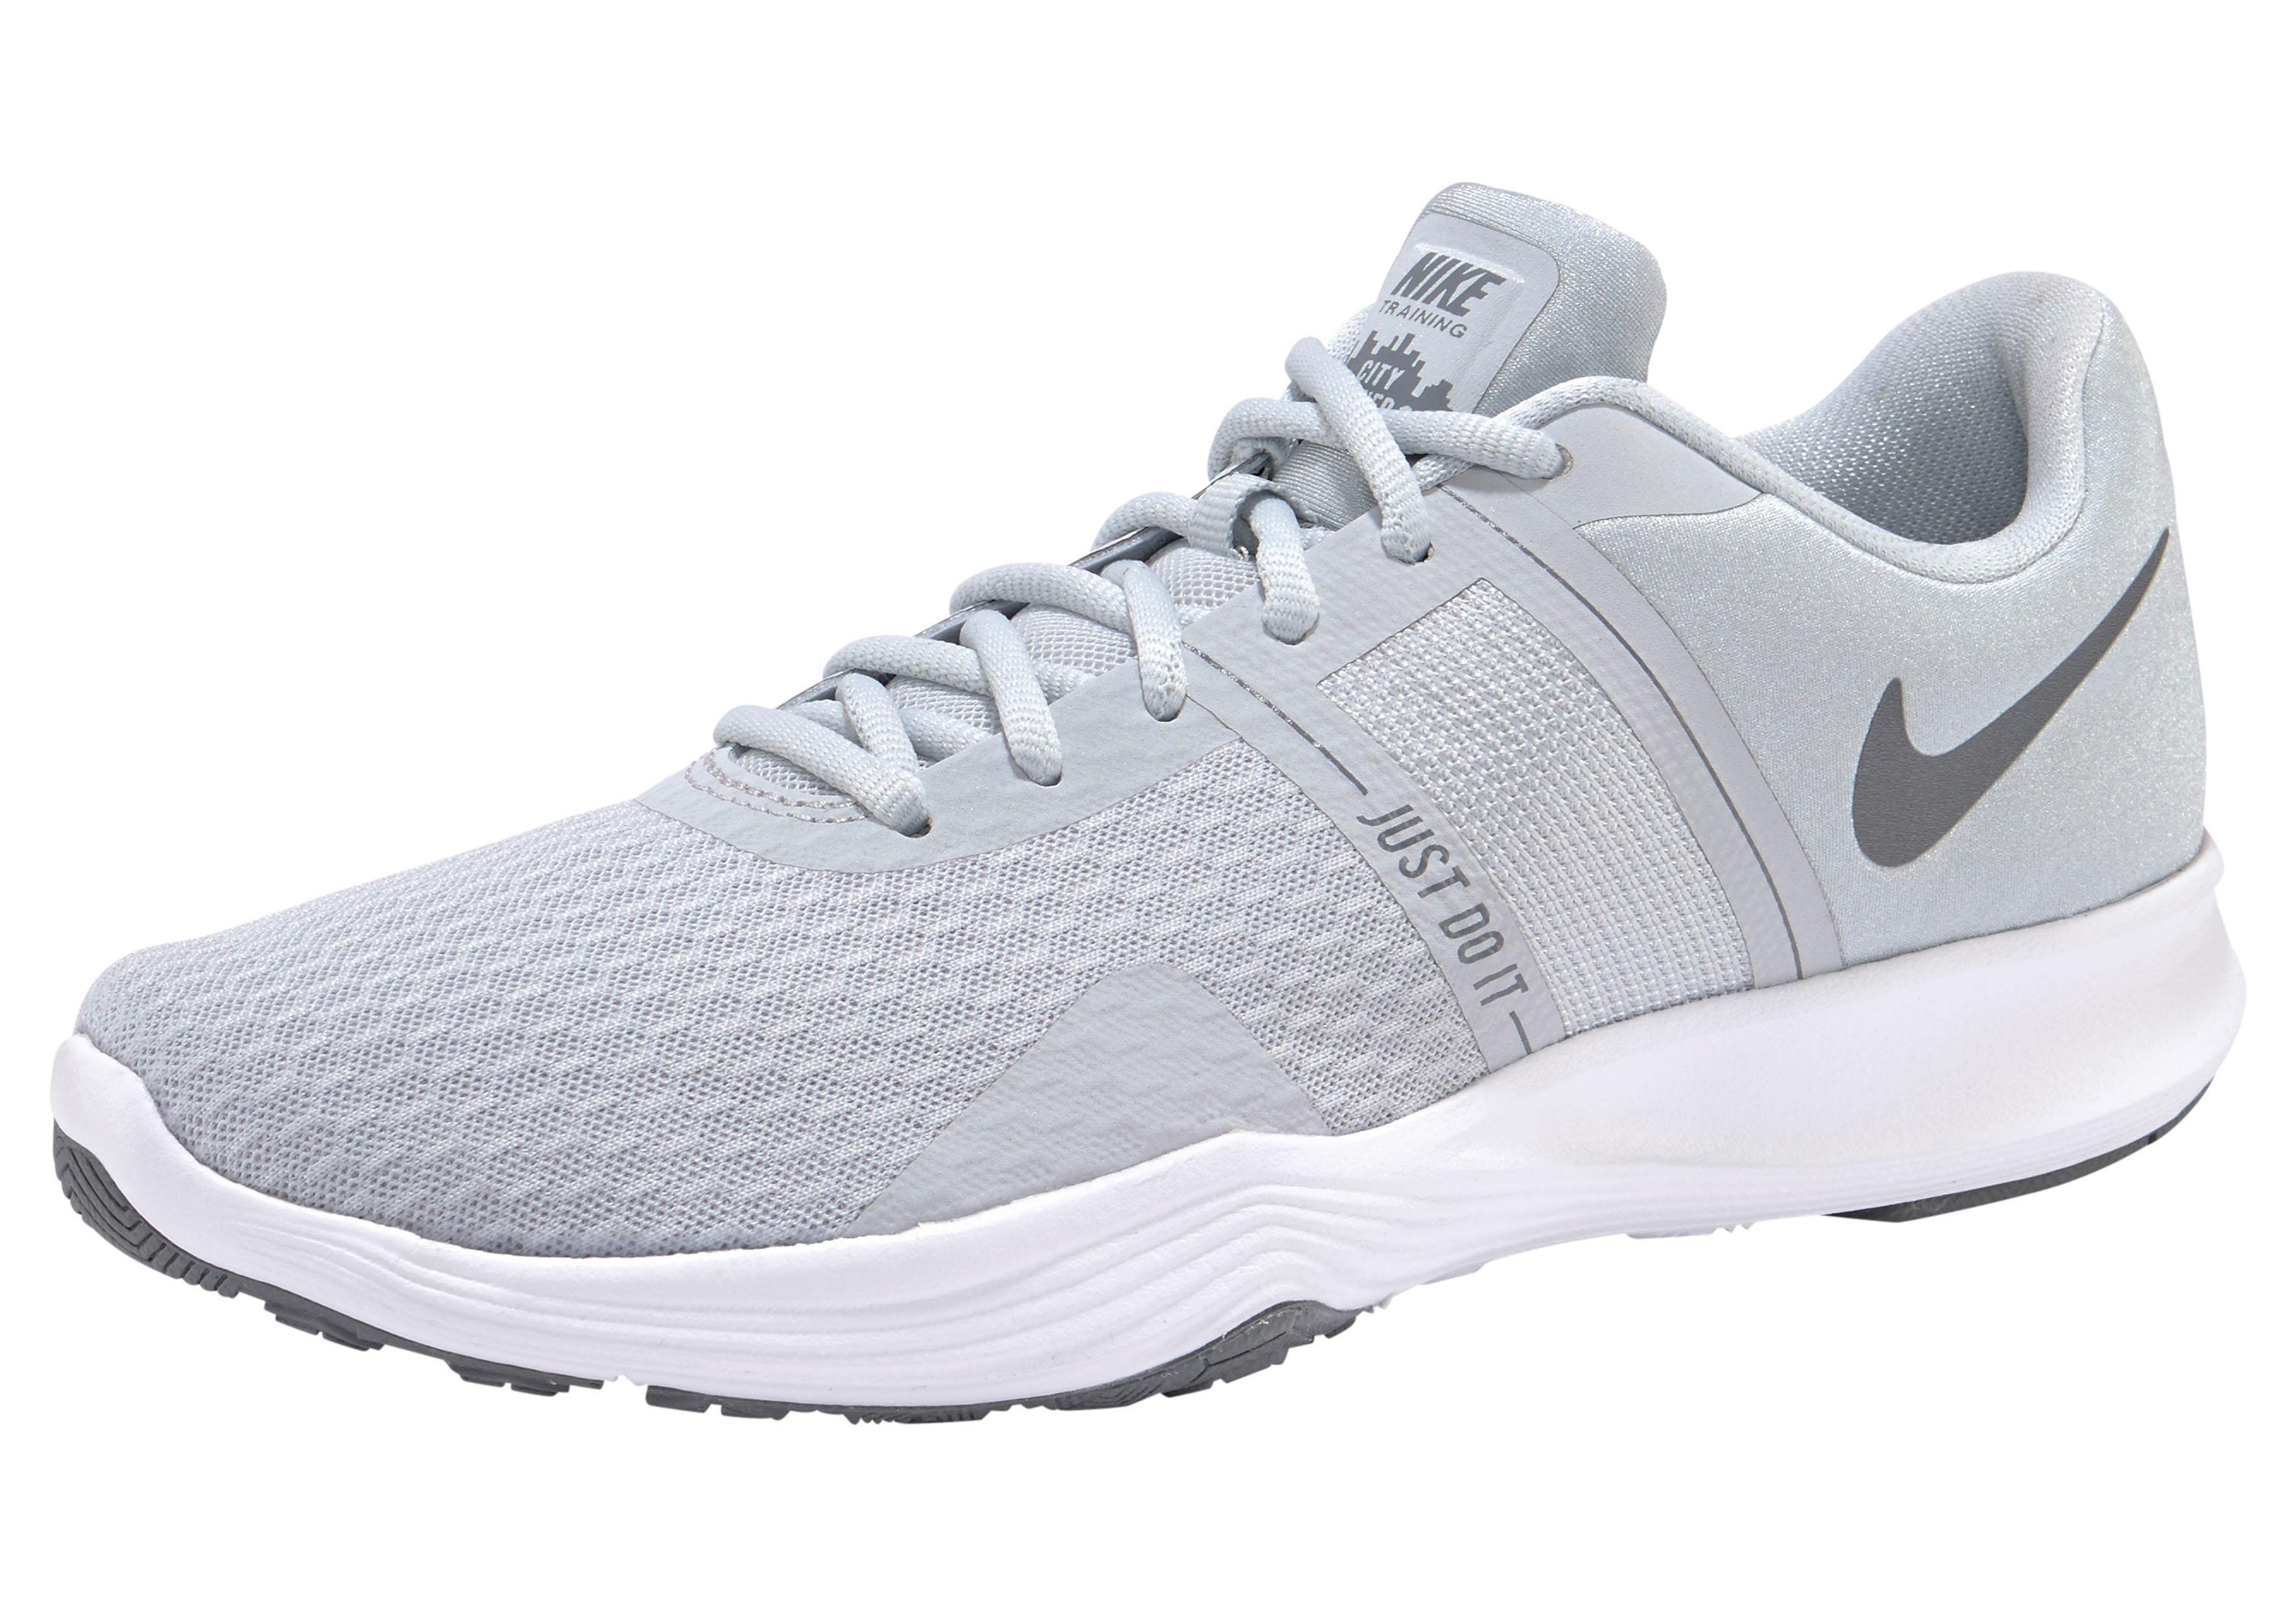 d8b10f2e411 ... Nike fitnessschoenen »Wmns In-season Tr 8«, Reebok fitnessschoenen  »Guresu 2.0«, Nike fitnessschoenen »Wmns Air Bella TR«, ...